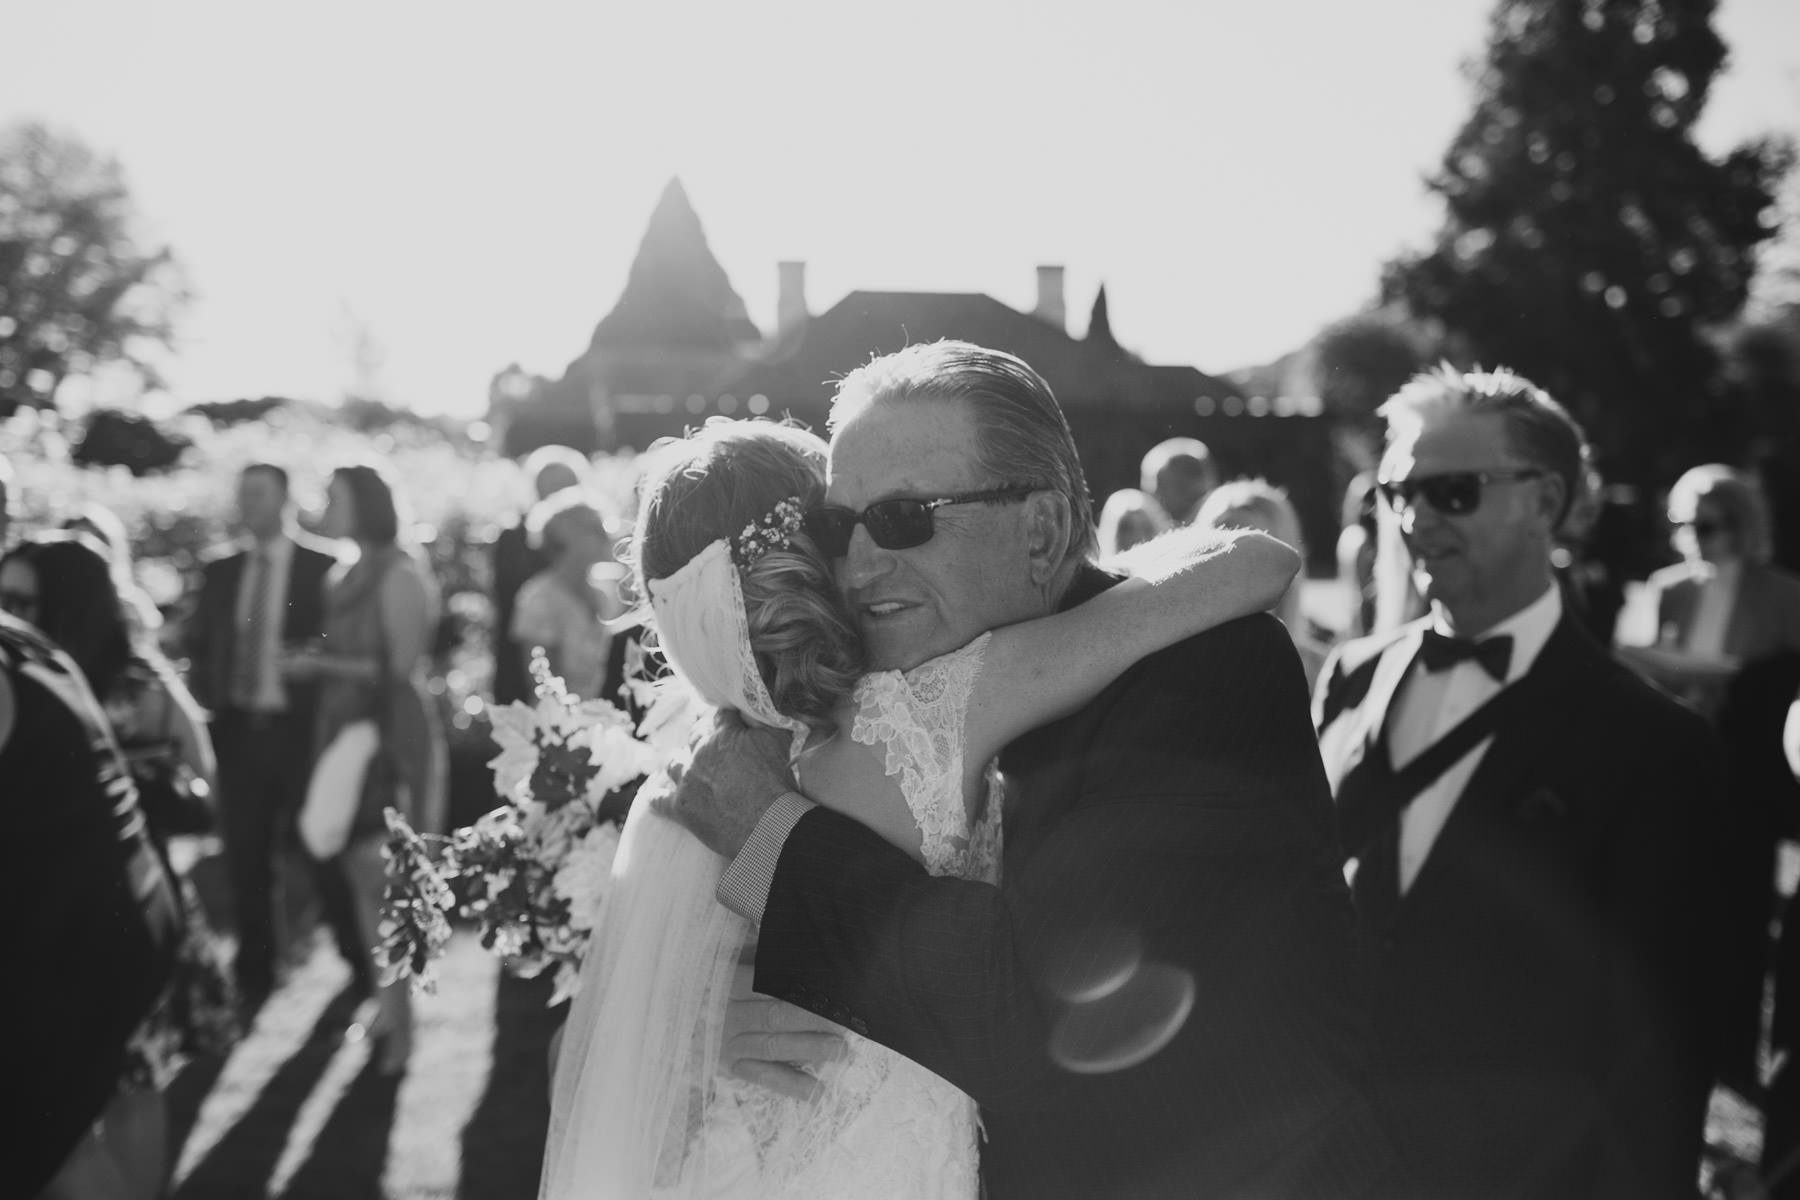 160506_justinaaron_wedding_holly_daniel_pr-118.jpg